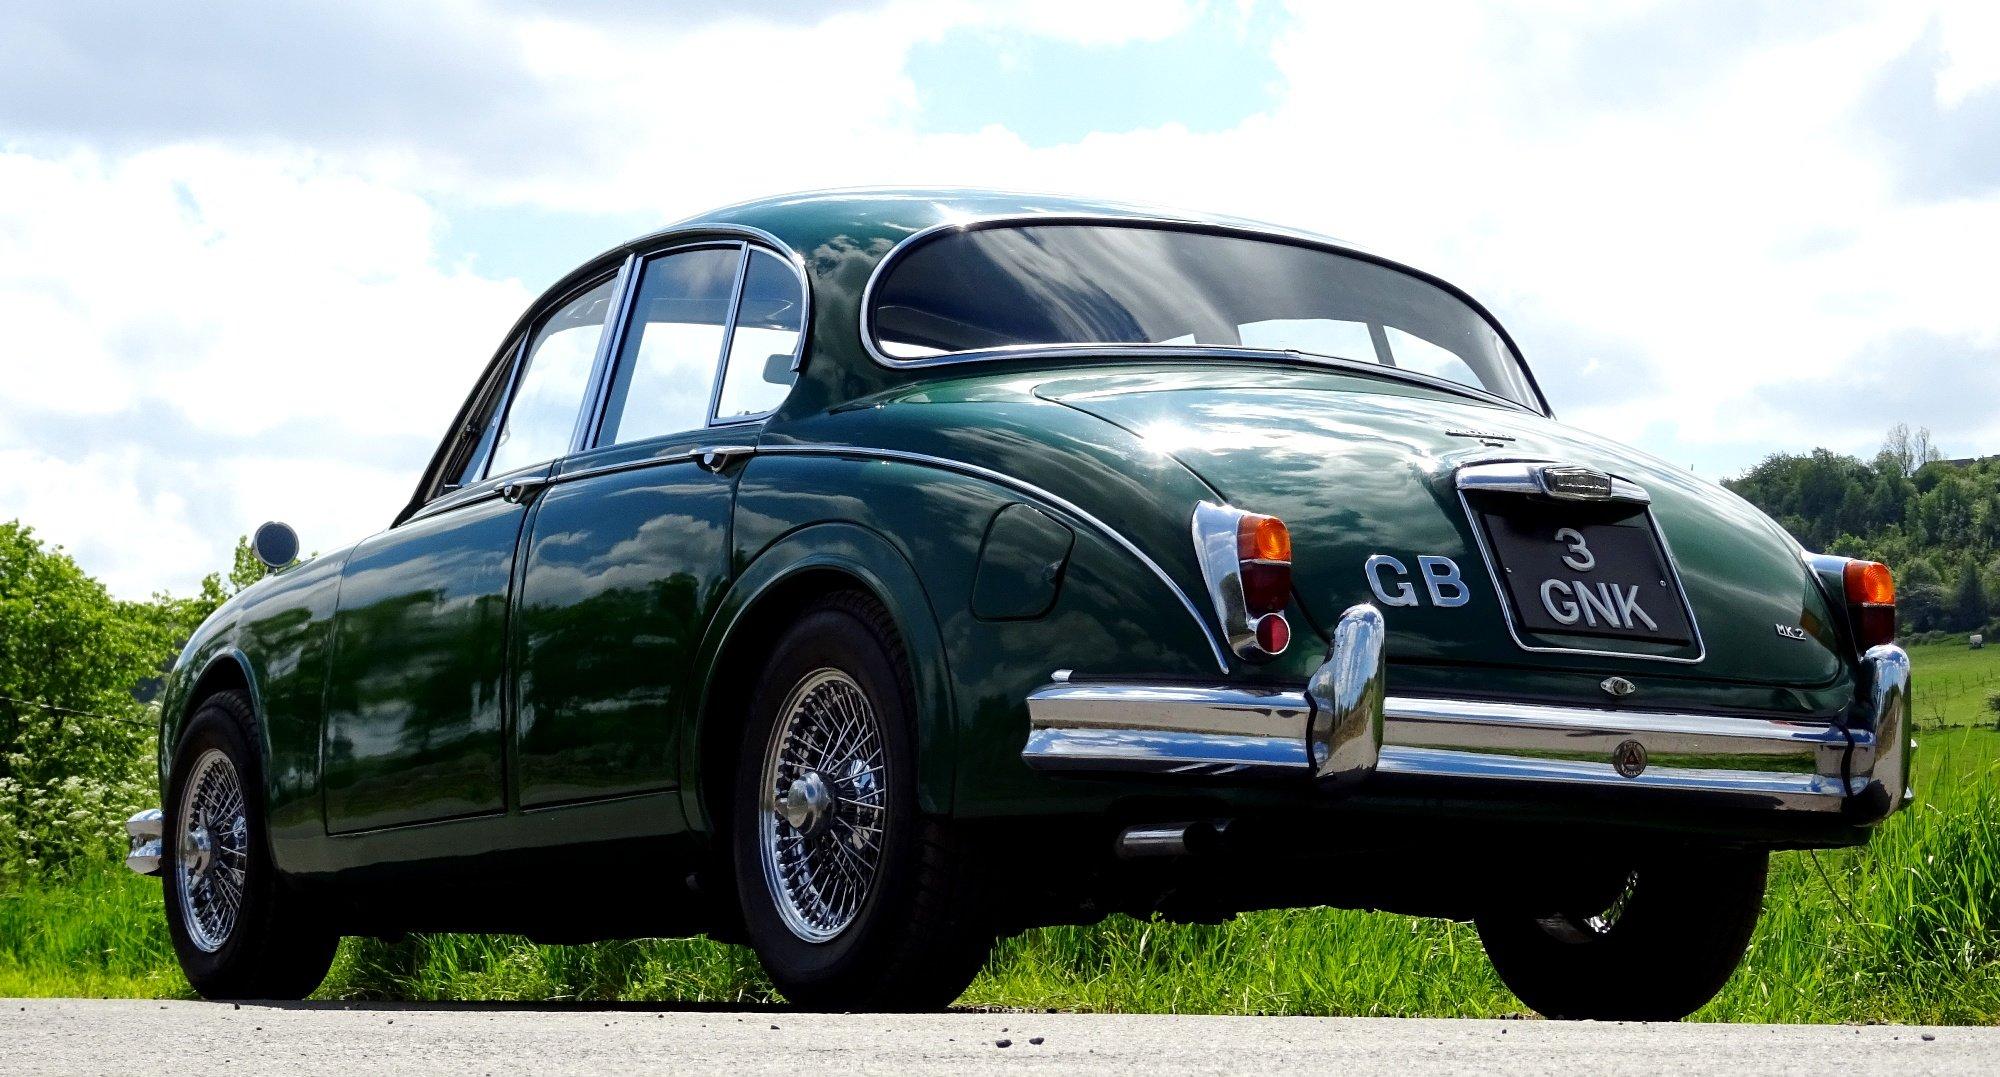 1961 JAGUAR MK2 3.8 LITRE BEAUTIFUL BRITISH CLASSIC CAR For Sale (picture 4 of 6)